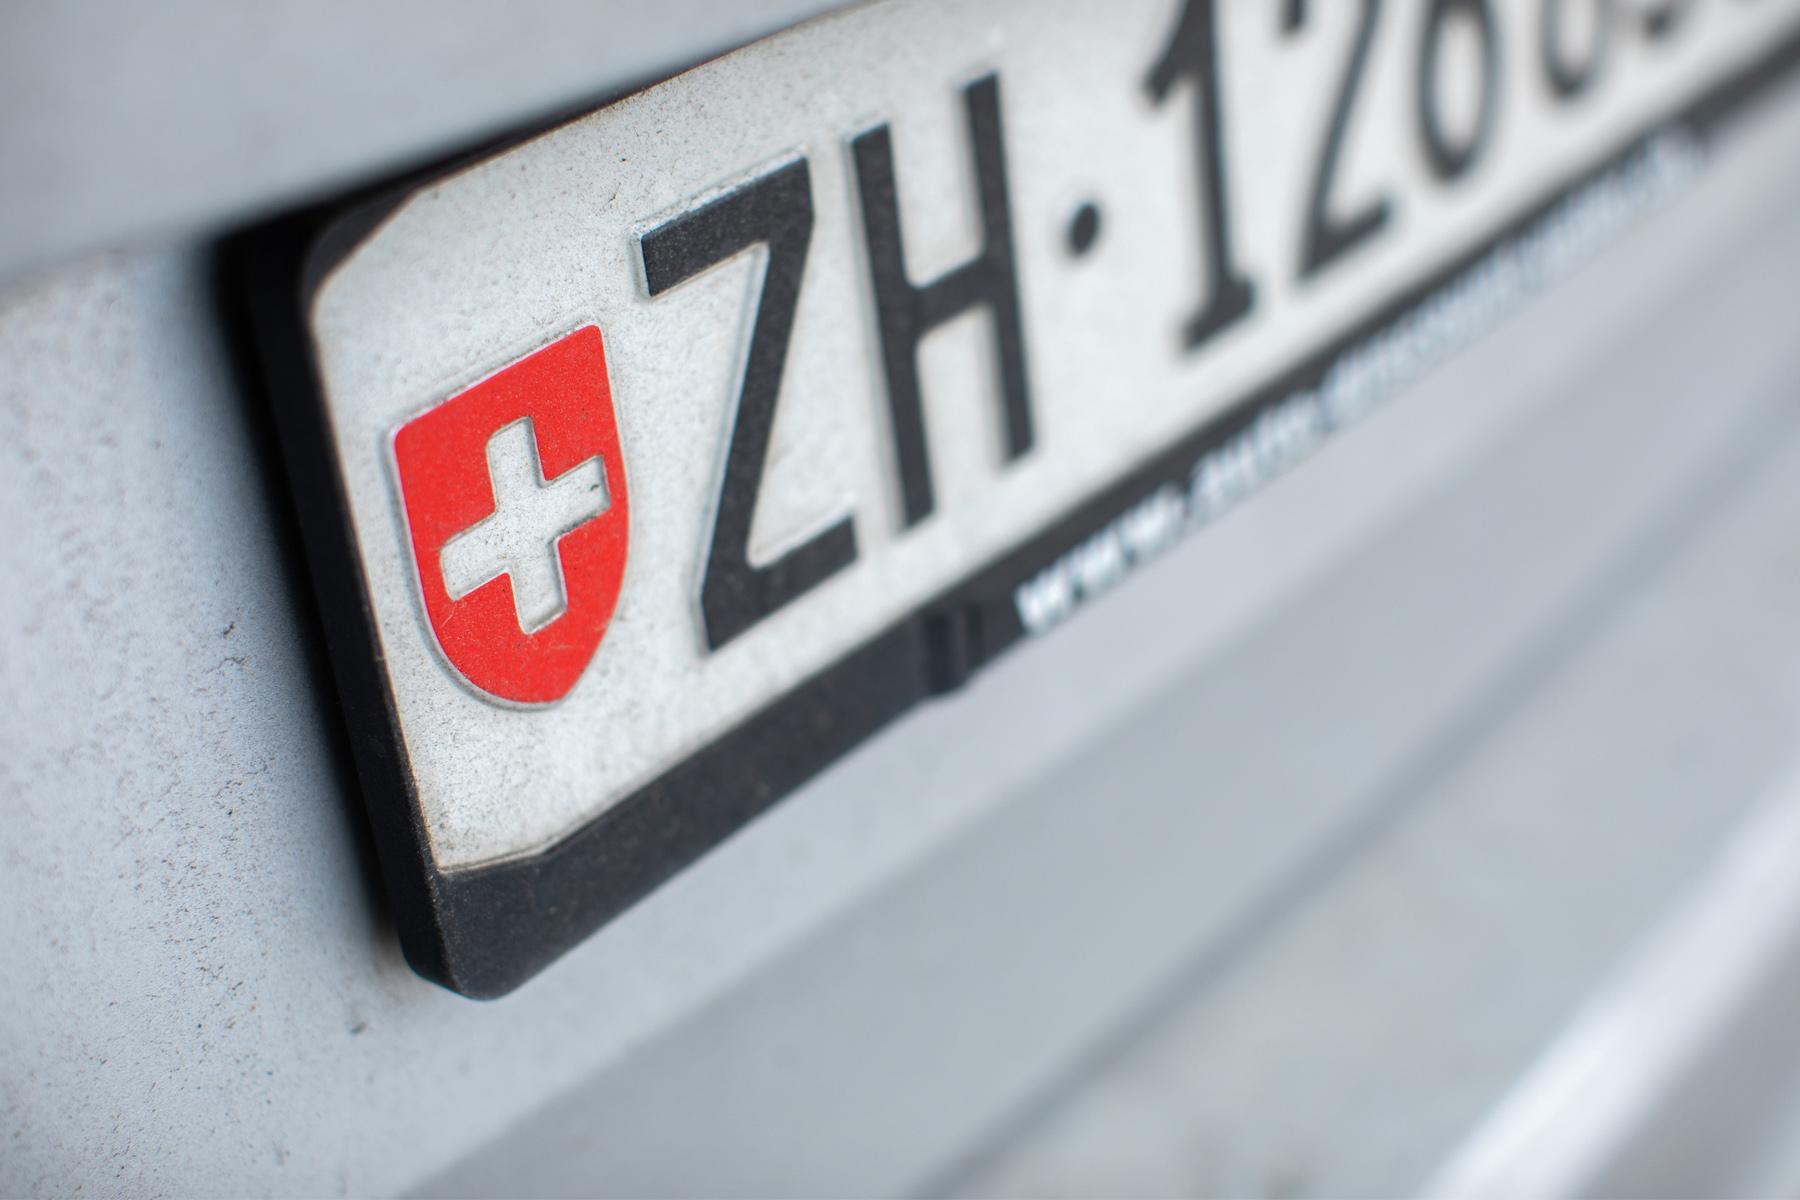 Swiss license plate